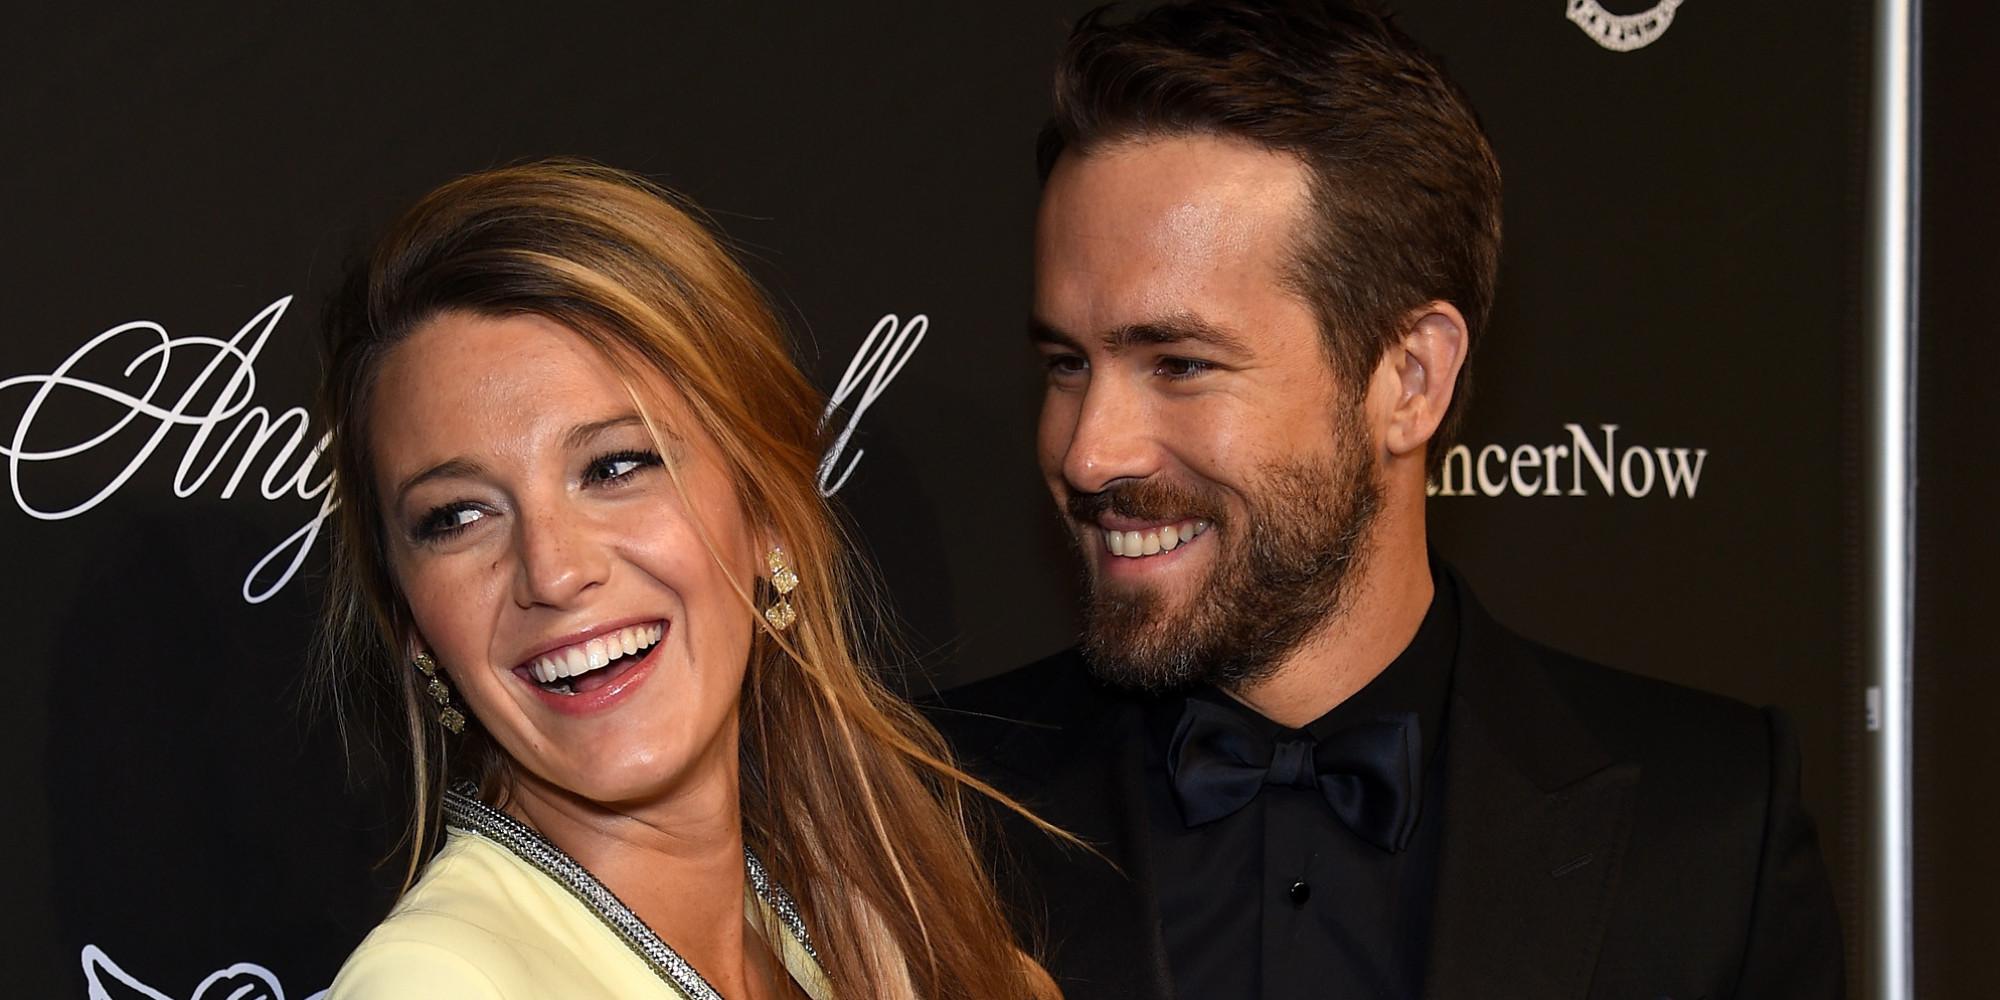 Ryan Reynolds And Blake Lively Blake Lively Reportedl...